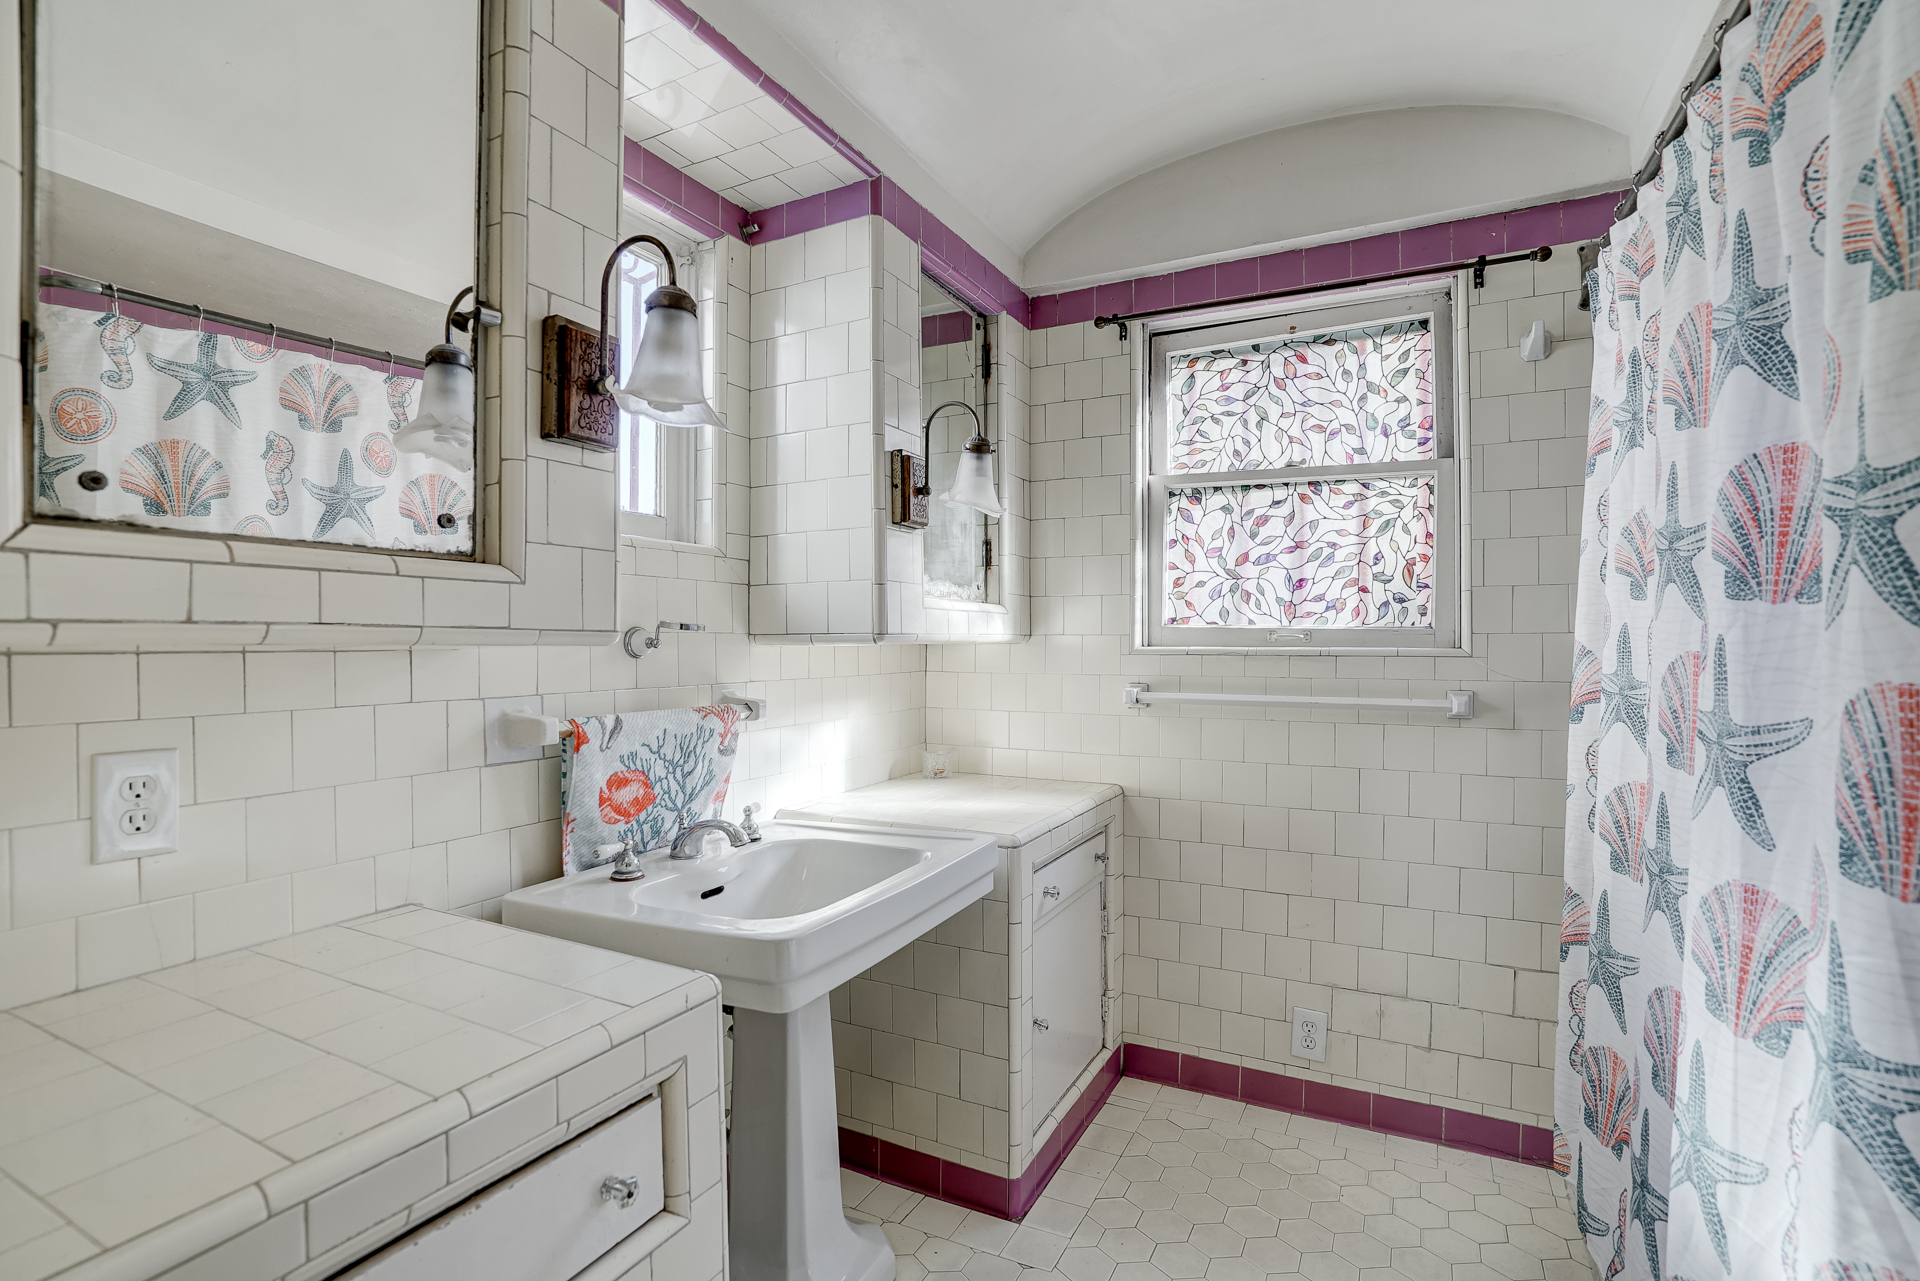 Vintage hallway bathroom with pedestal sink and shower in tub.